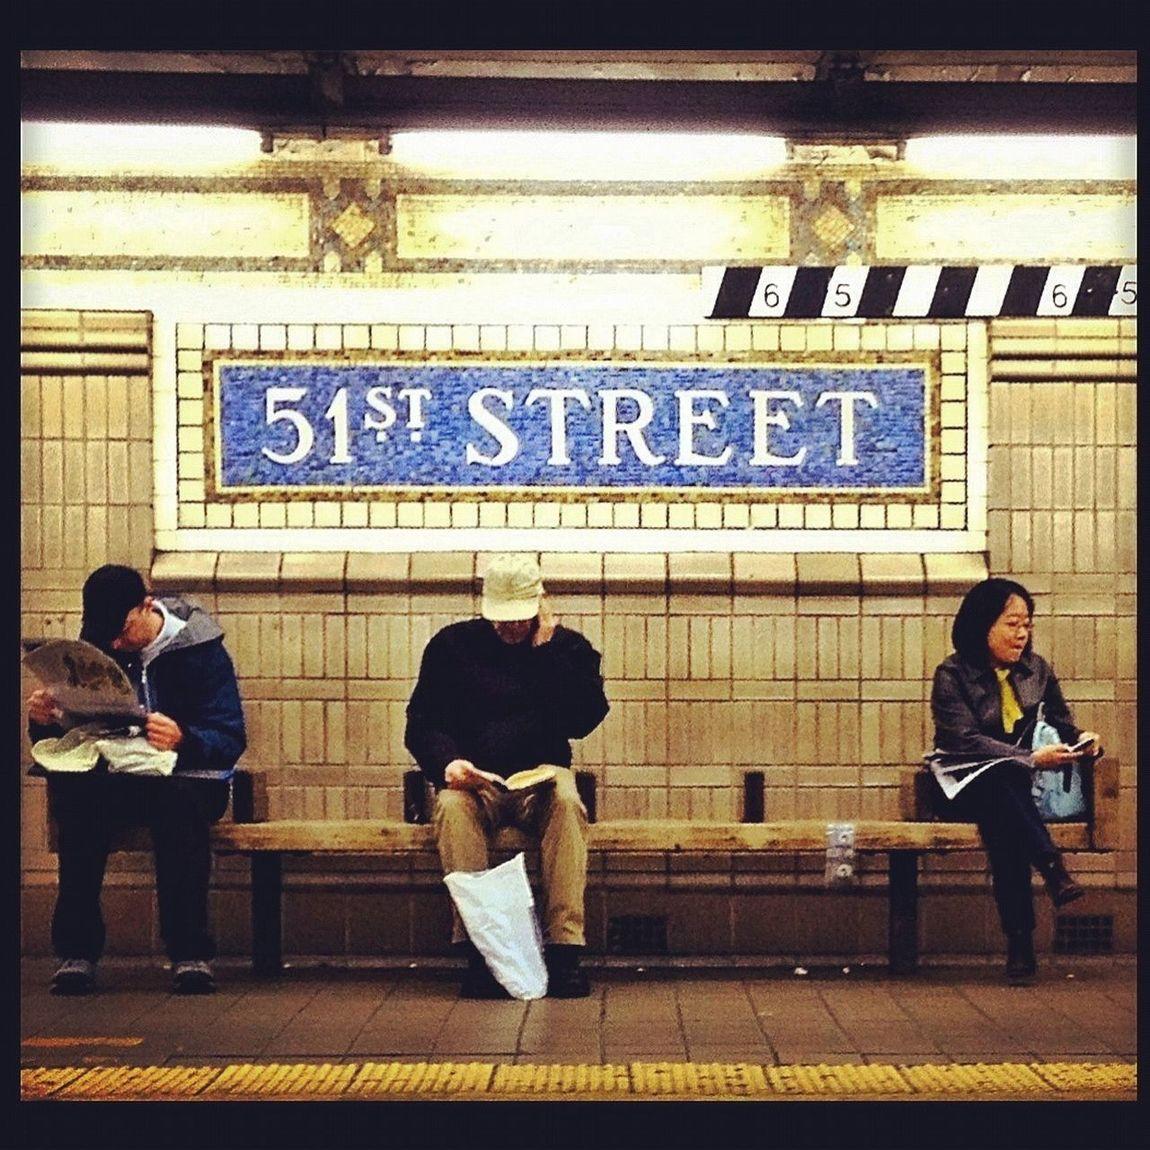 51st Street 51st Street